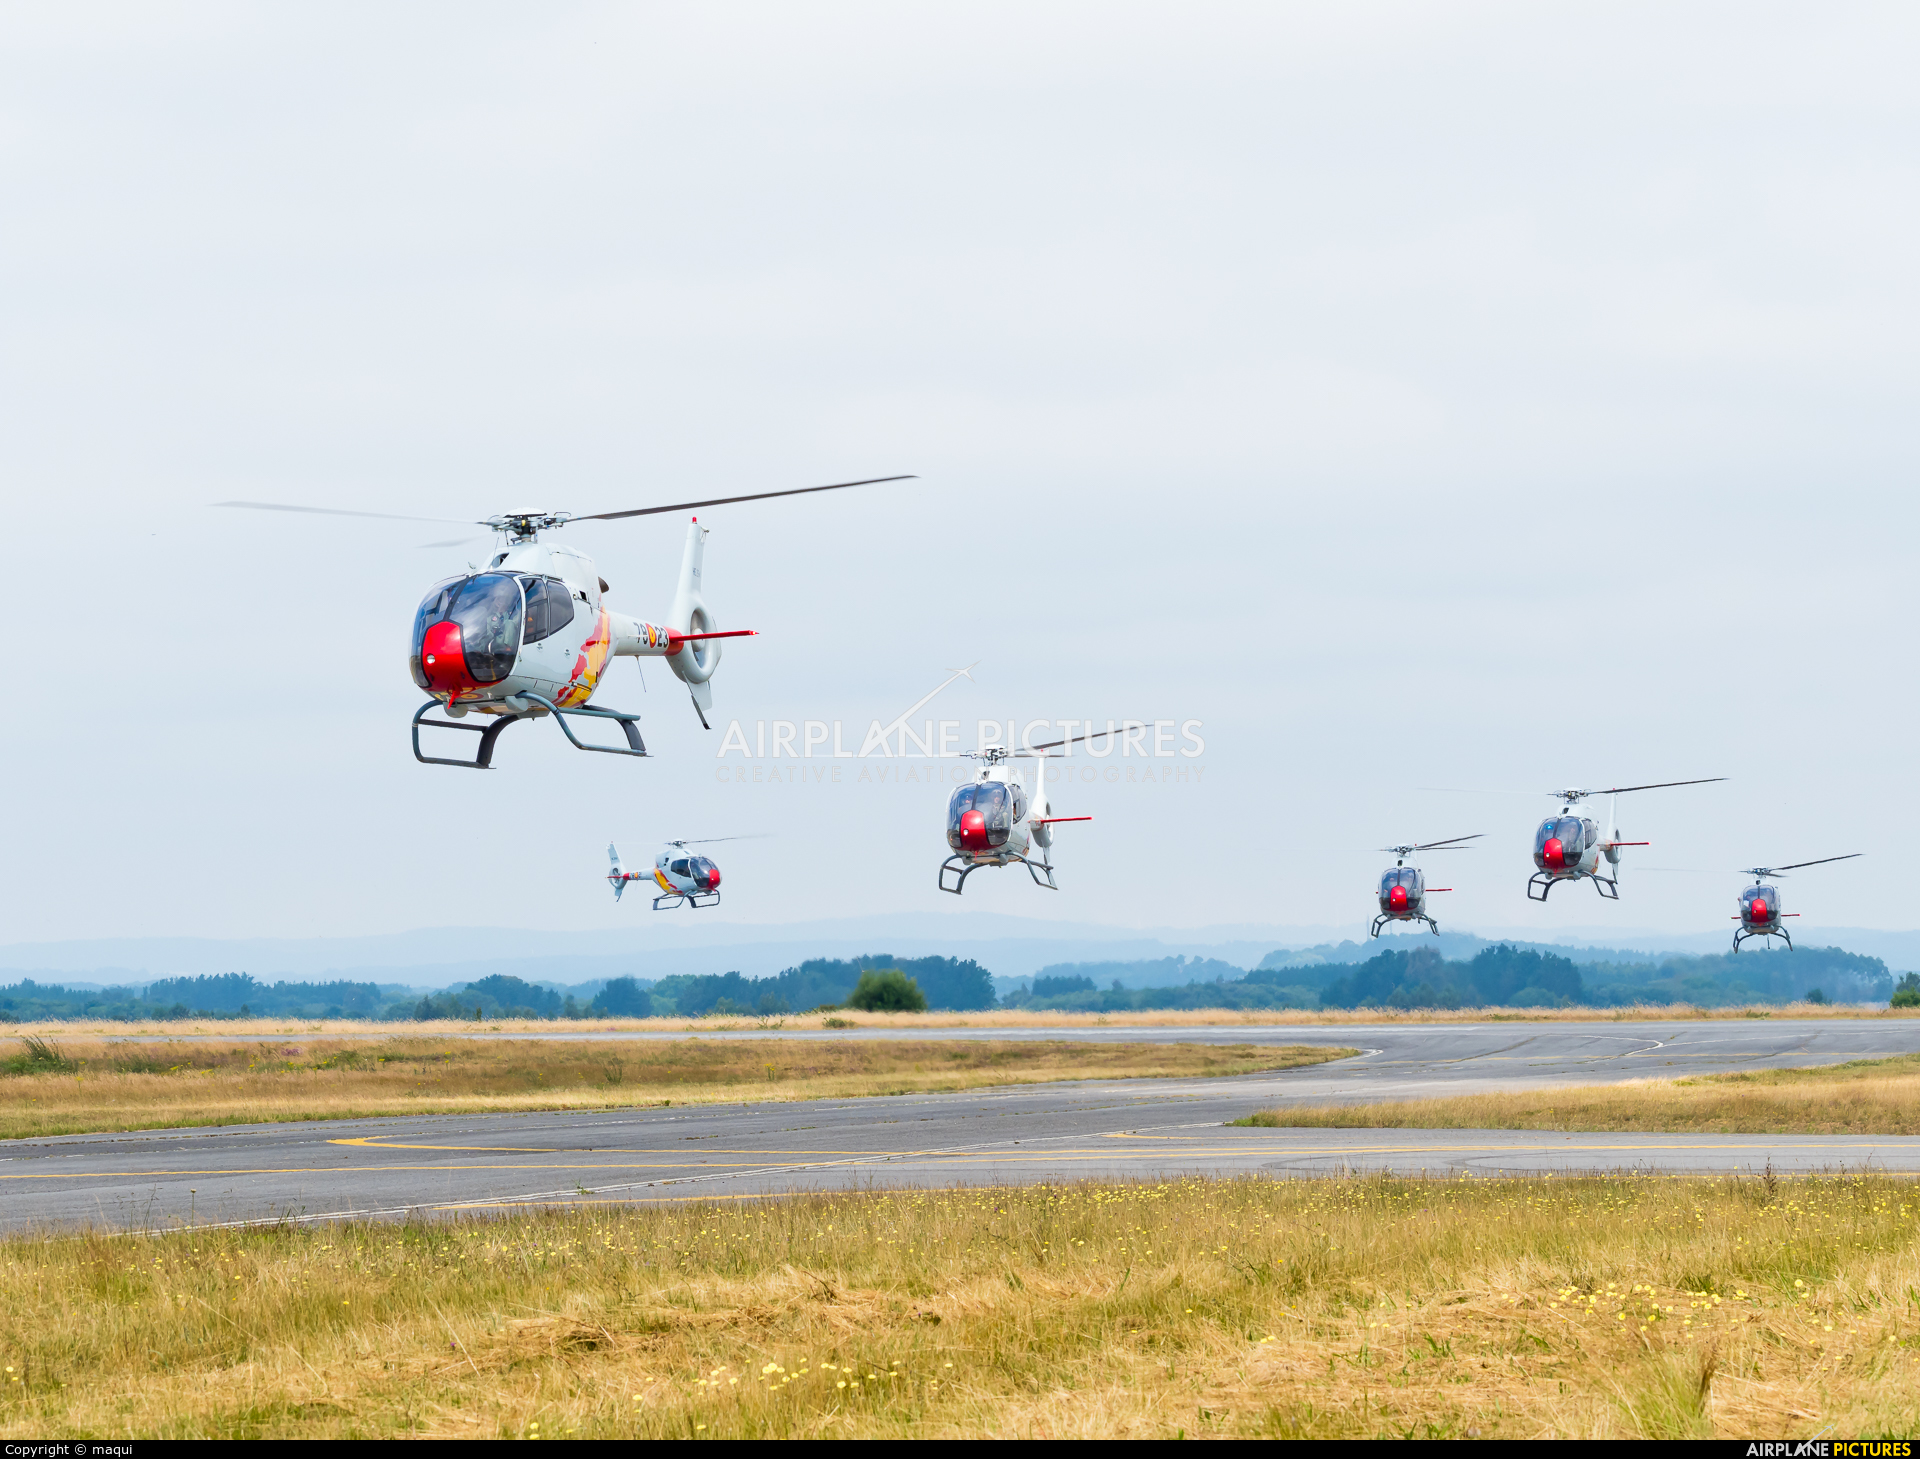 Spain - Air Force: Patrulla ASPA HE.25-4 aircraft at Lugo - Rozas